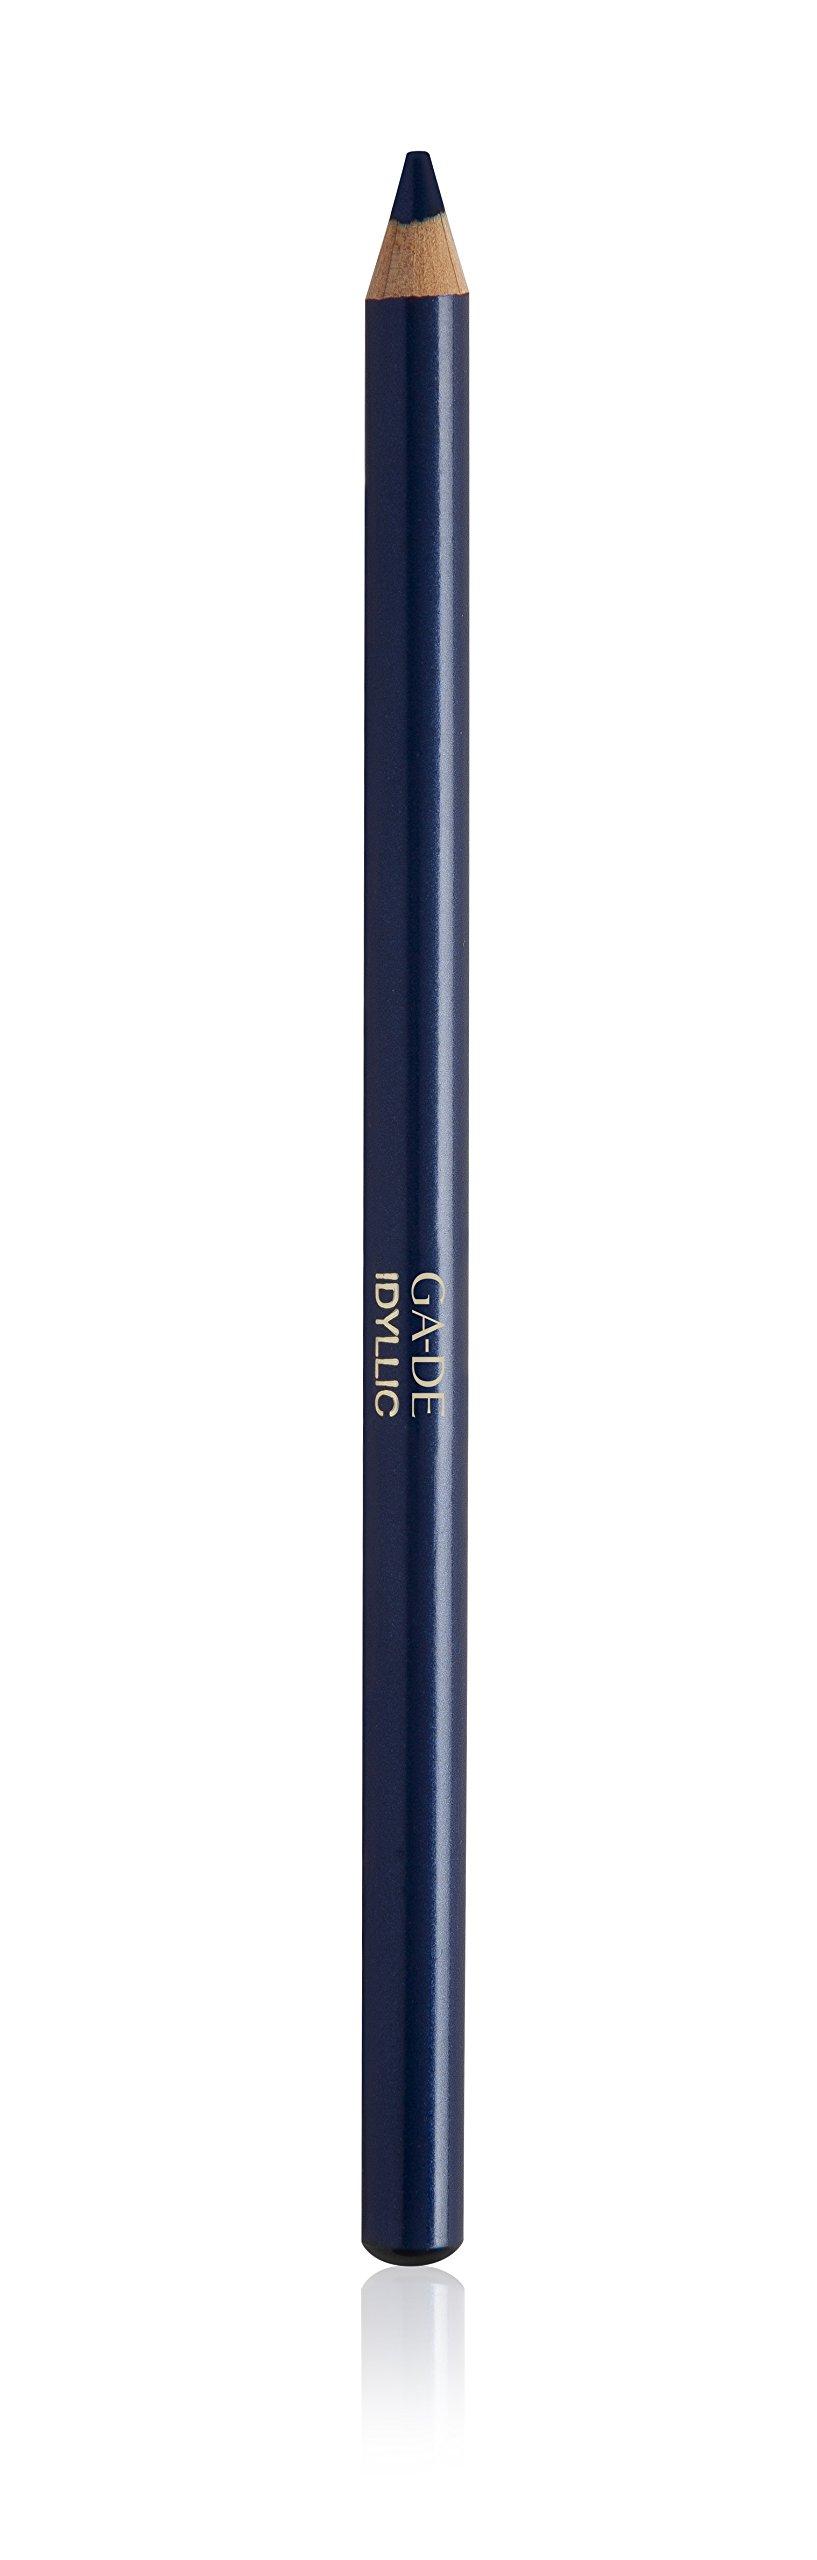 Pencil Idyllic Kajal Eyeliner By GA-DE COSMETICS (Midnight Blue No.201)